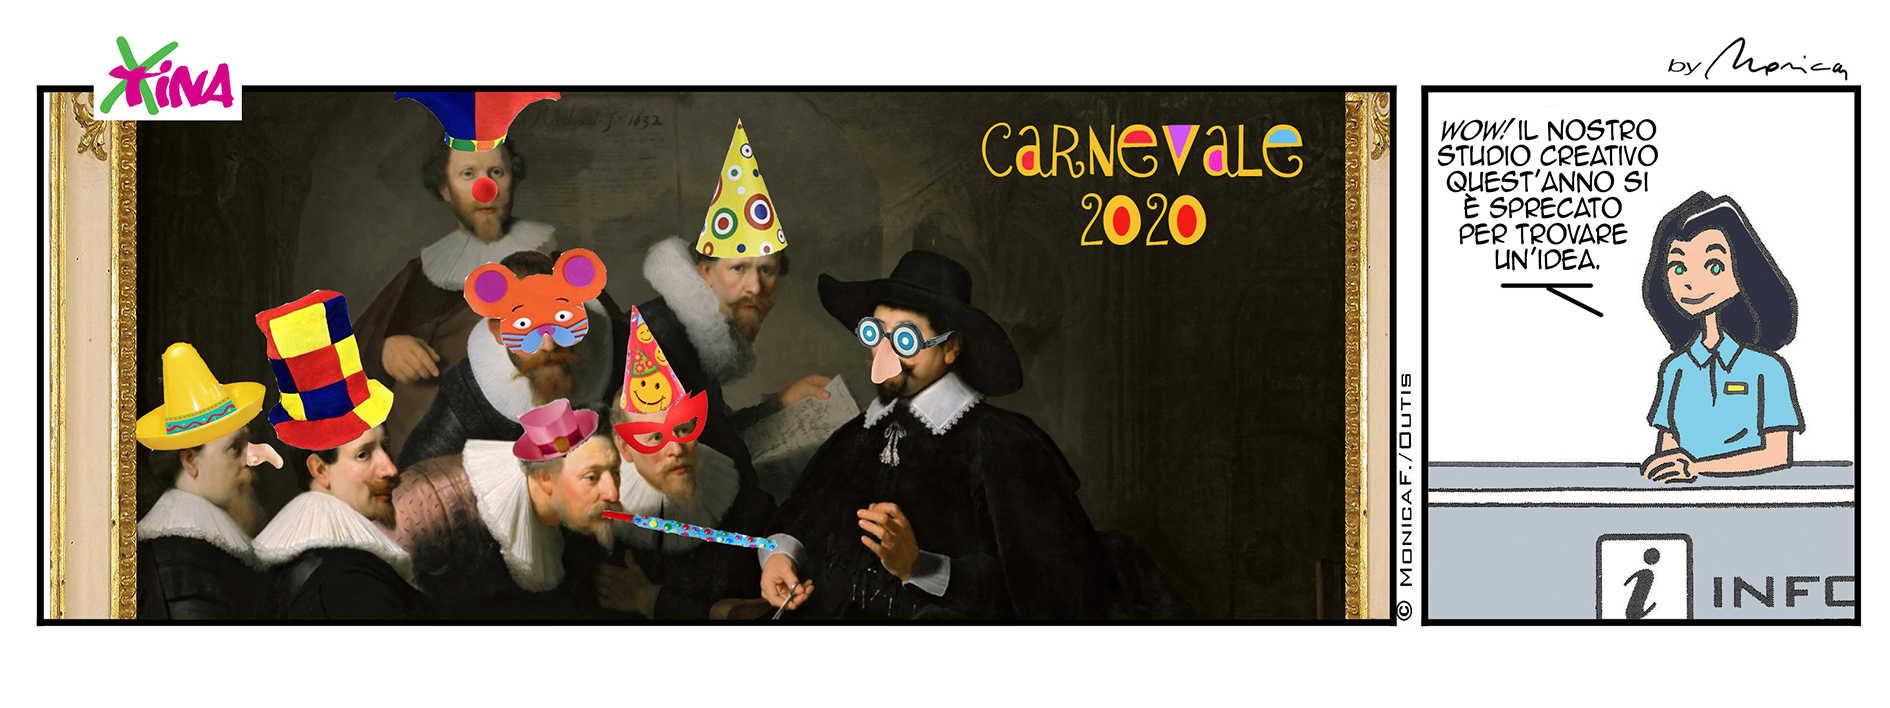 Xtina comic strip Carnevale 2020